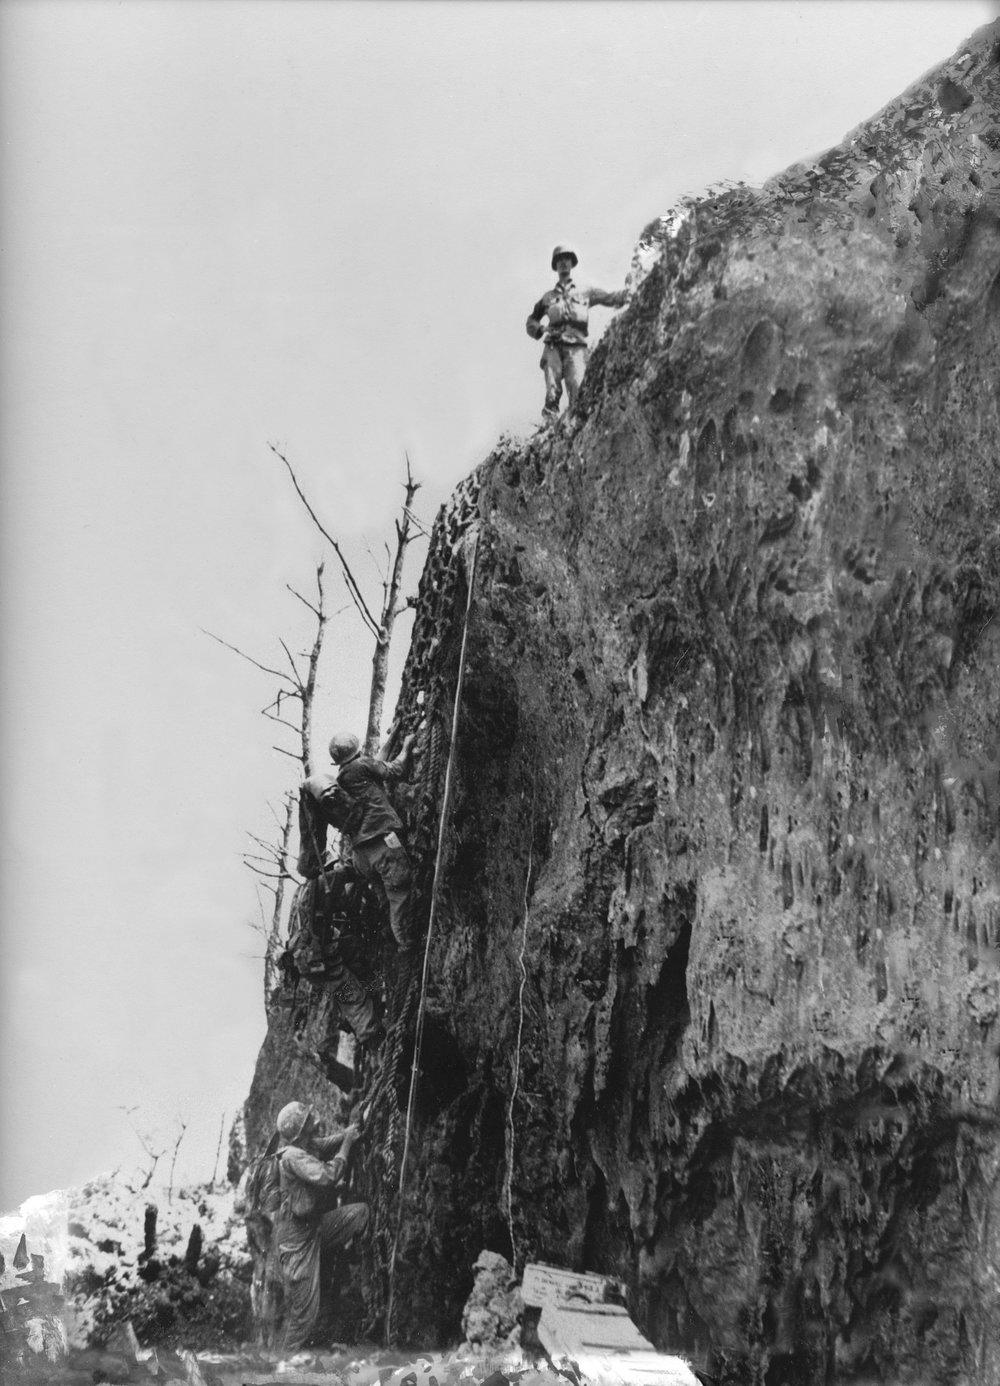 Desmond Doss standing above the cargo nets on the Maeda Escarpment, 1945